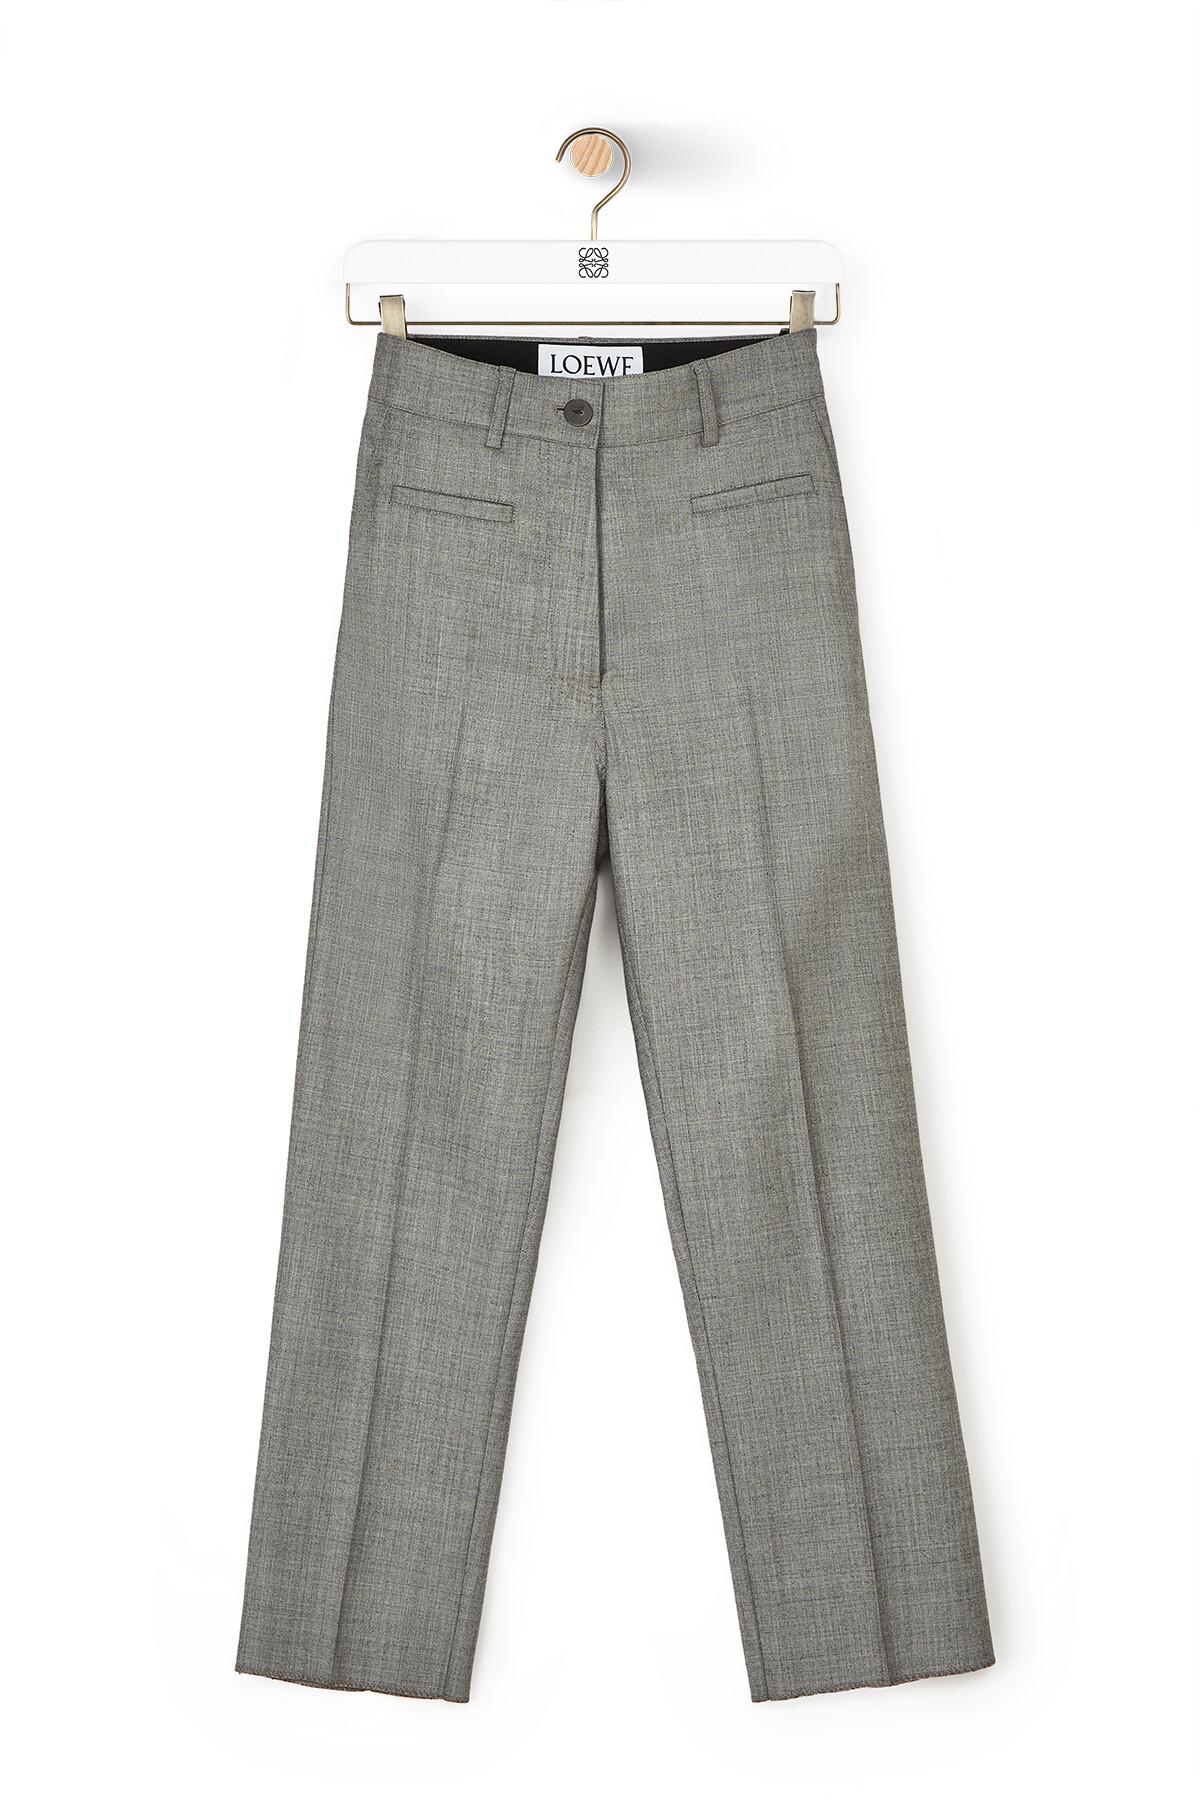 LOEWE Fisherman Trousers Grey front